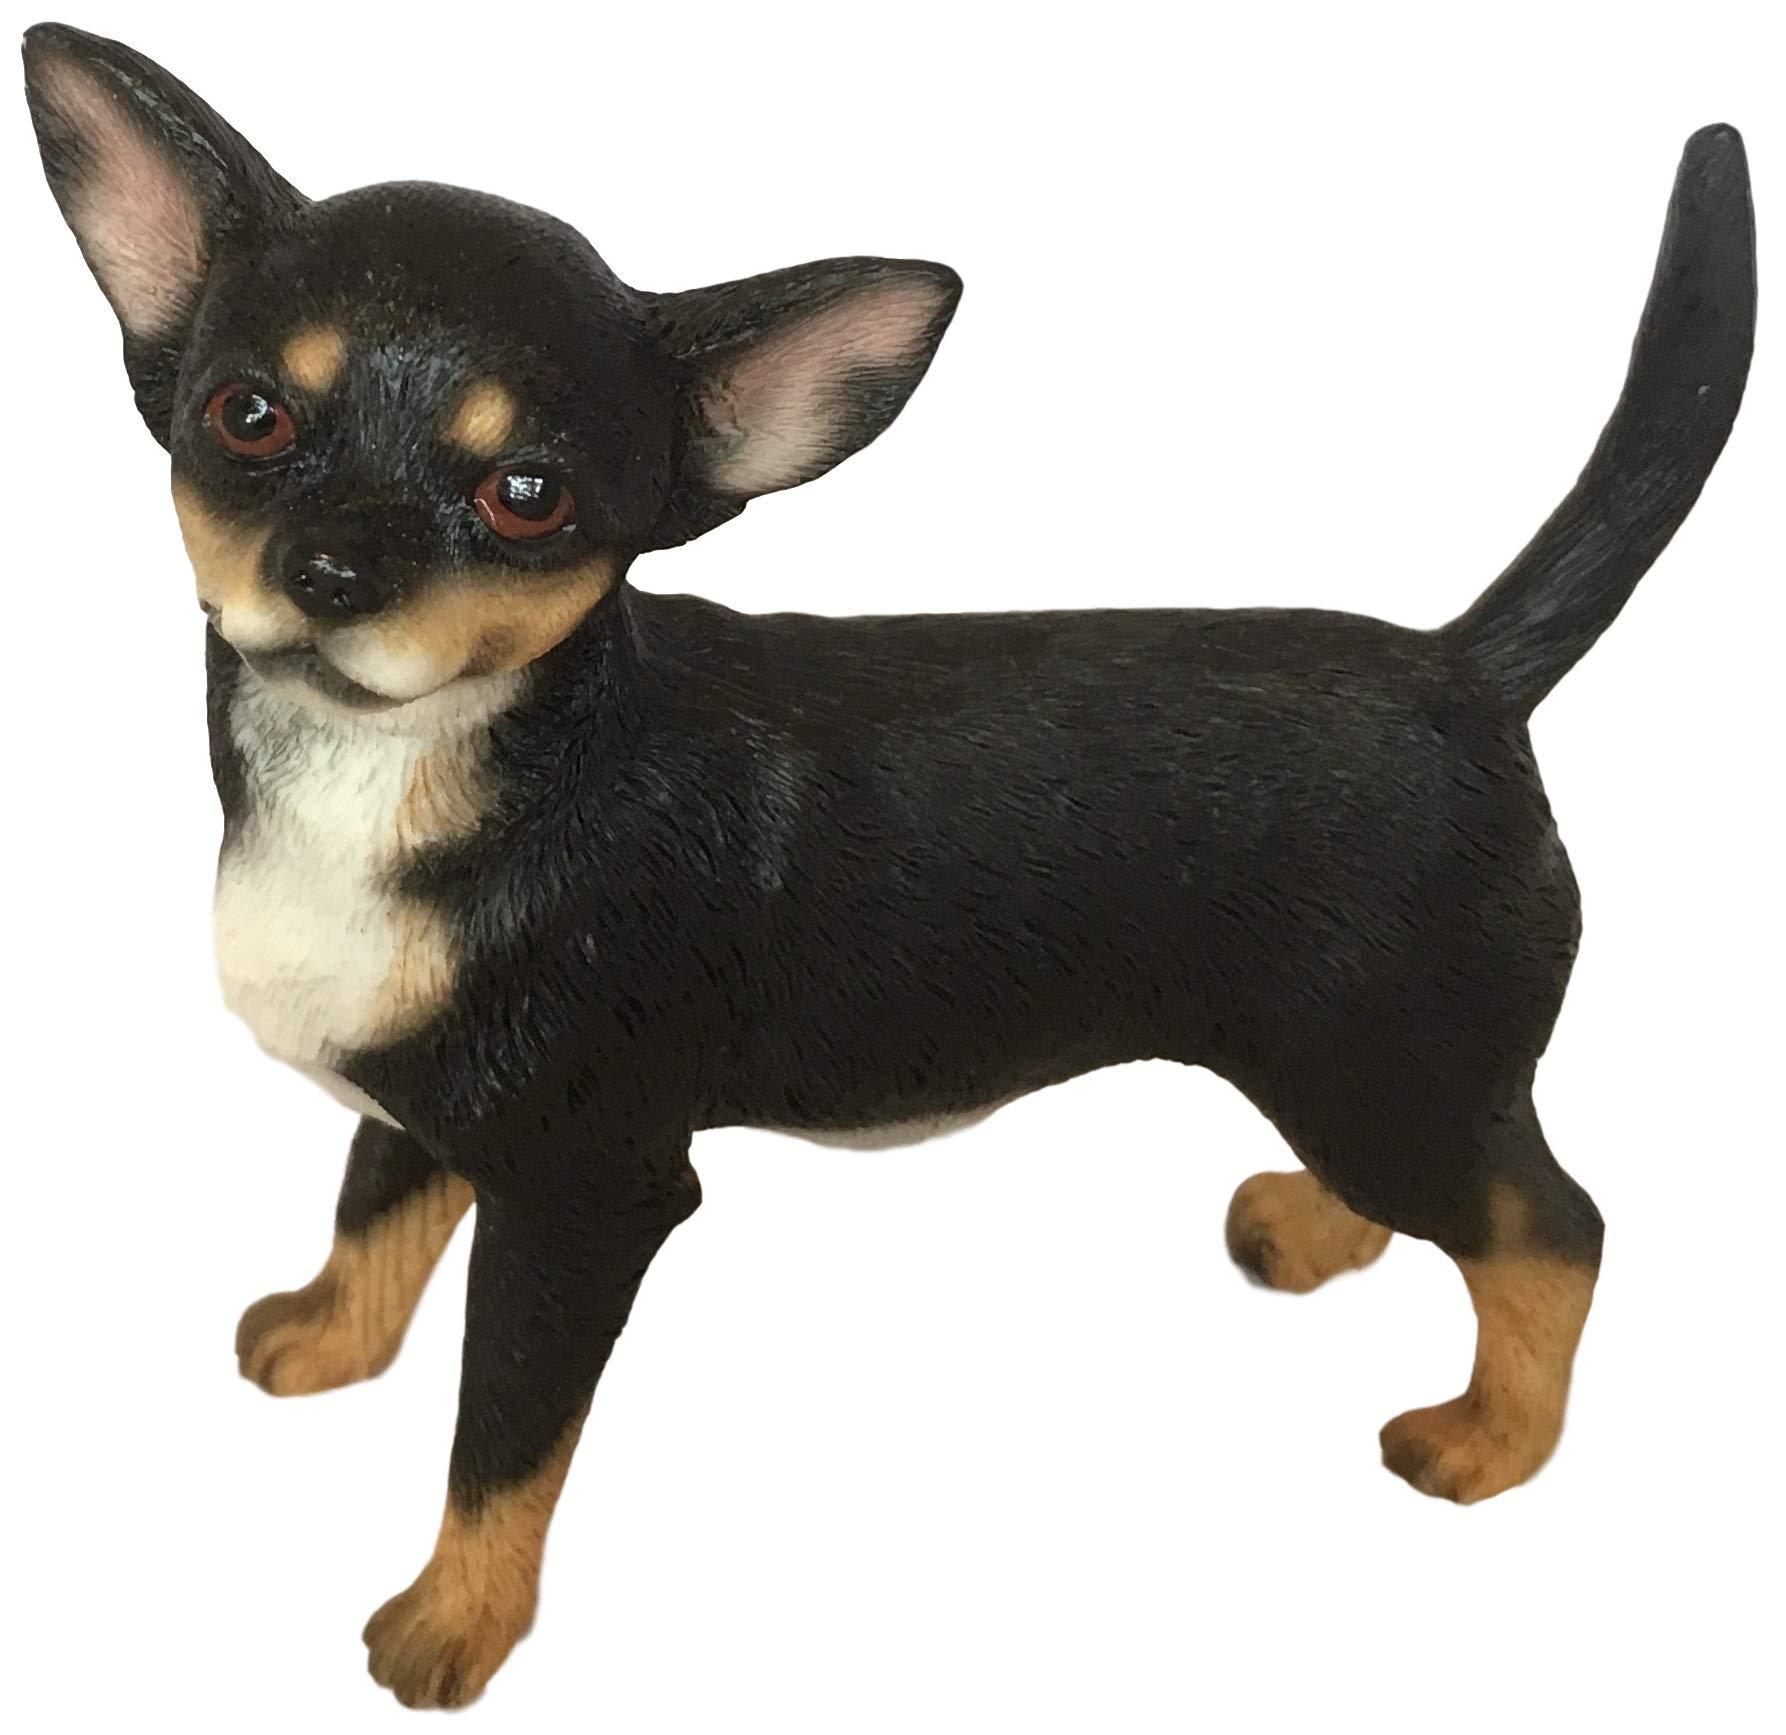 Leonardo Collection Tan Chihuahua Ornament Dog Figurine Resin Figure Gift Box